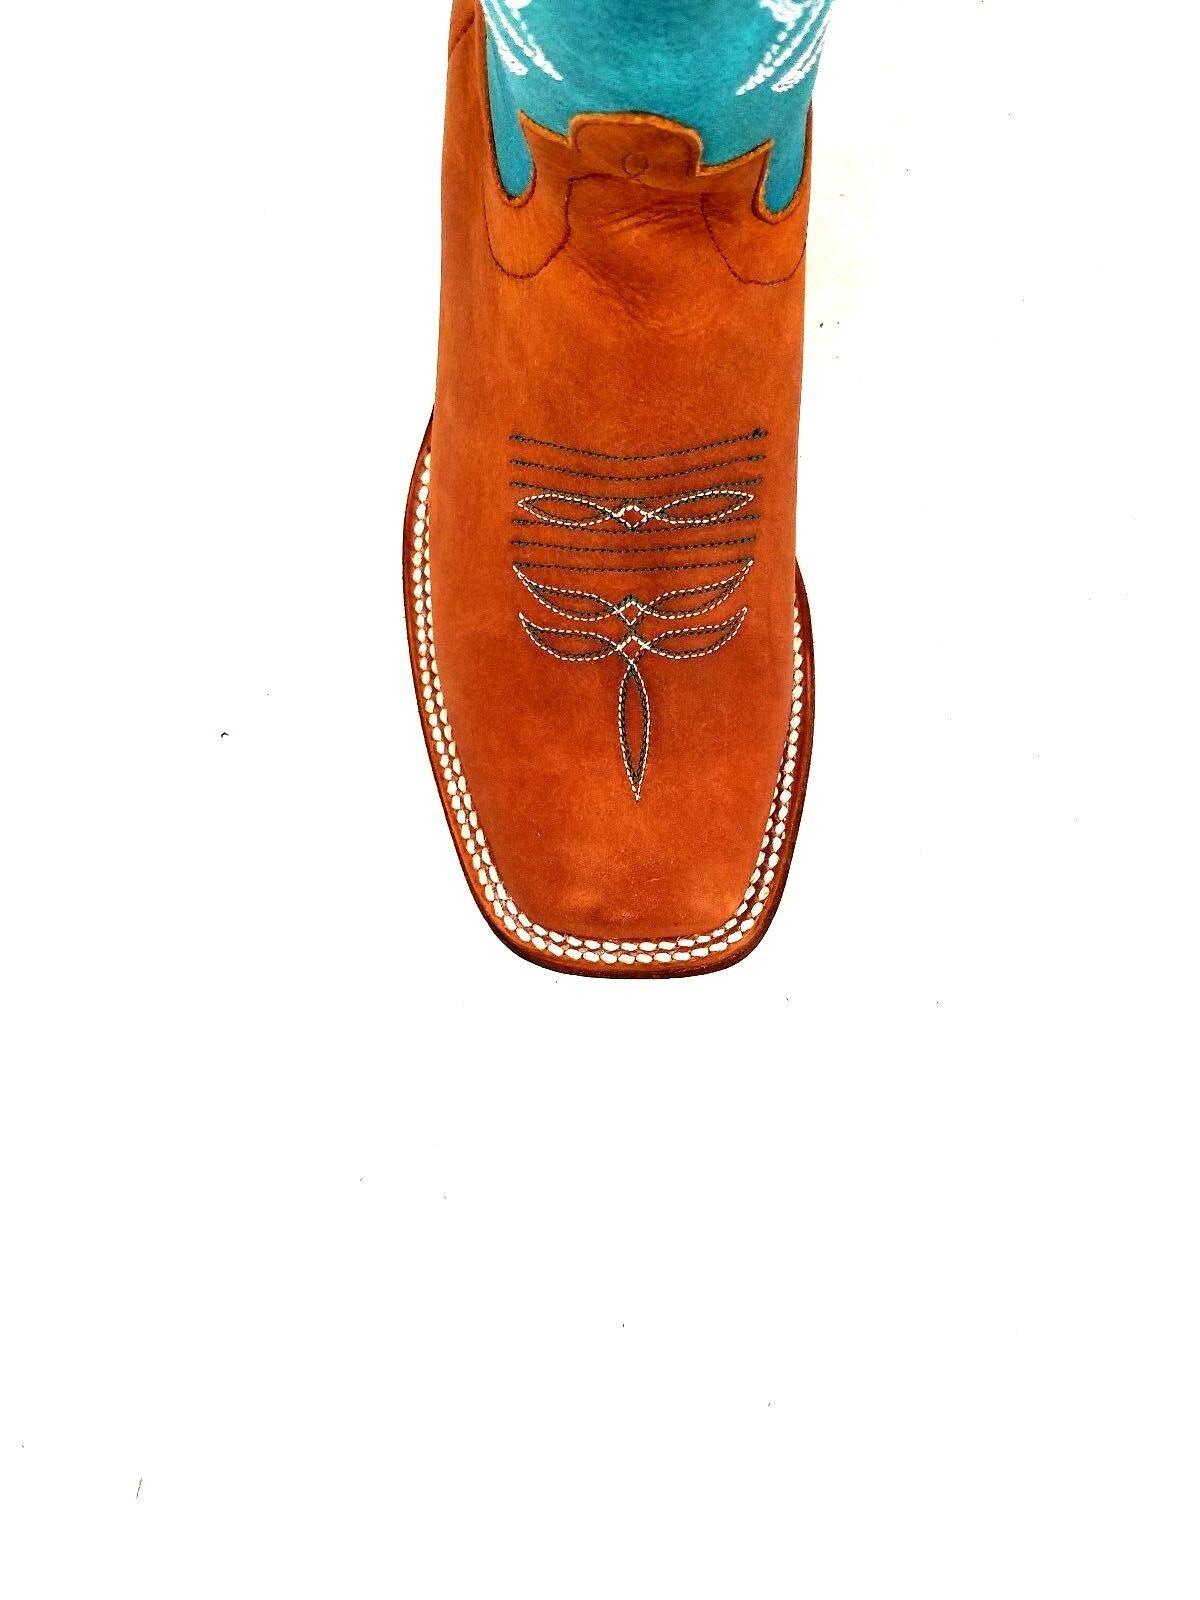 Macie Bean Pocket Top Again Square Toe Toe Toe Western Boots M9126 Zipper 2d72d6